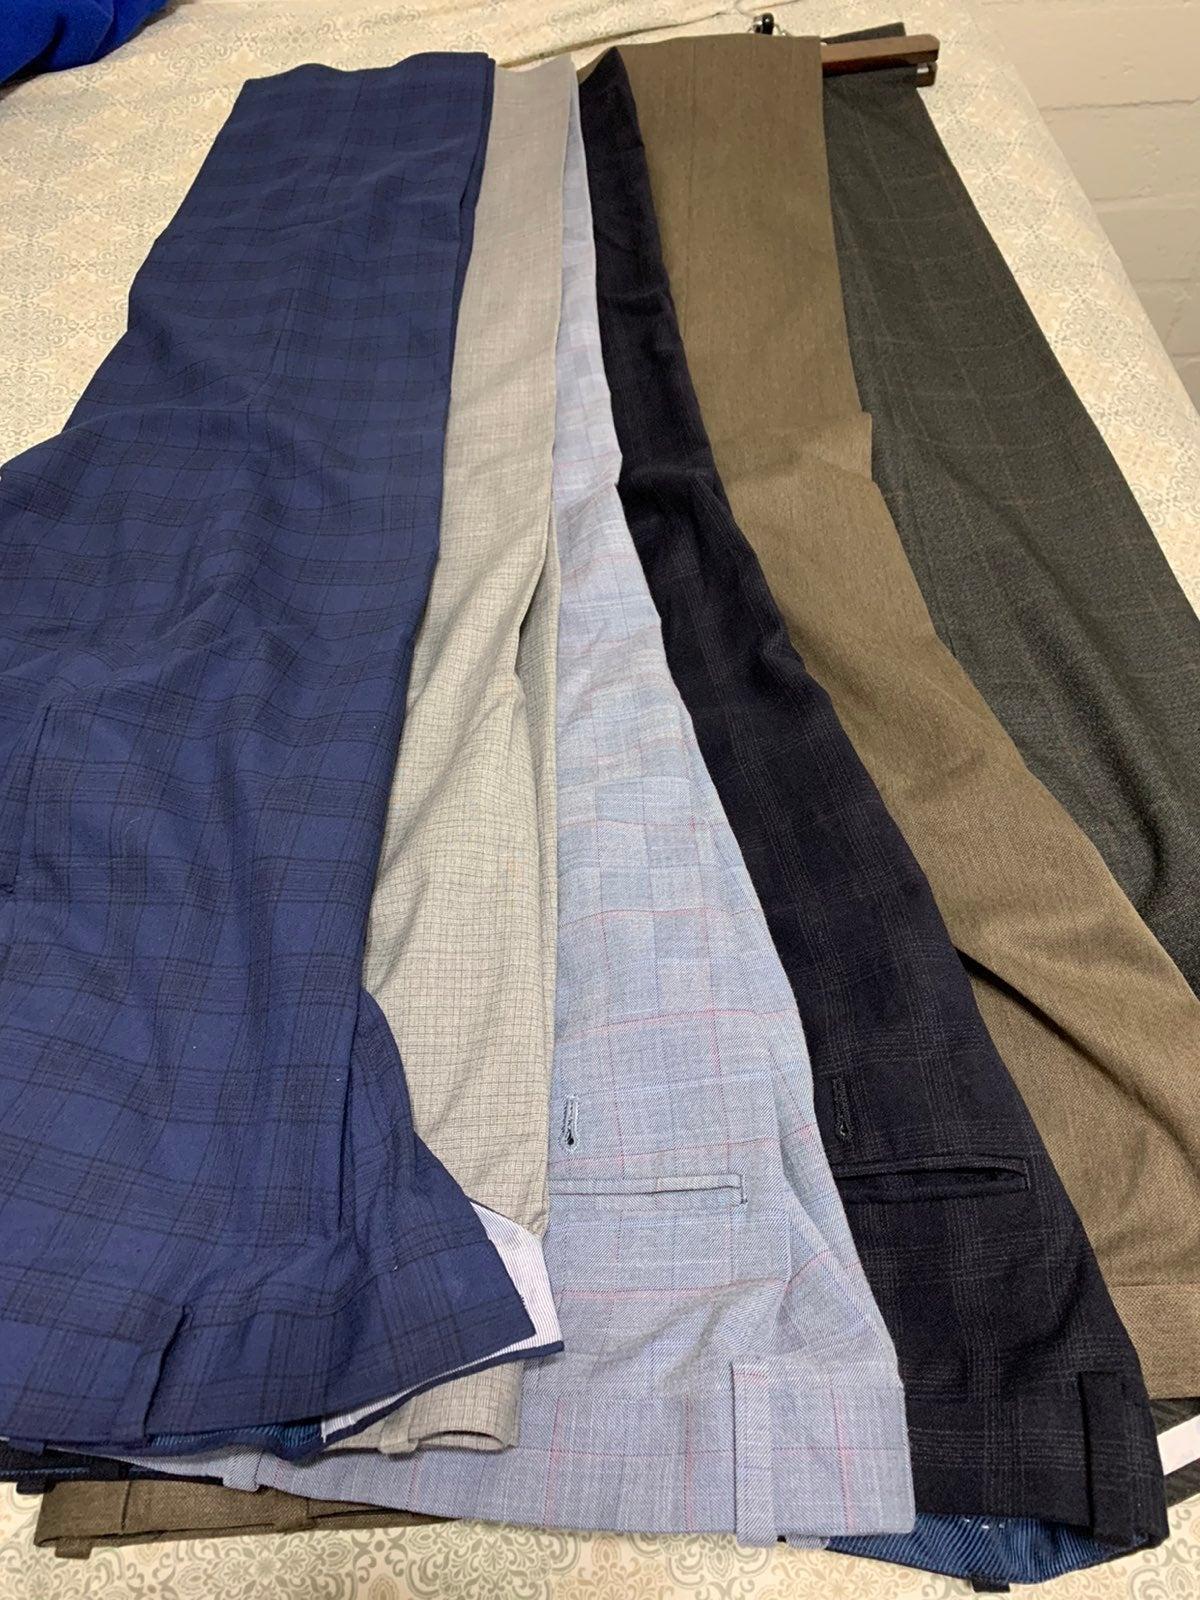 6 Perry Ellis Dress Pants